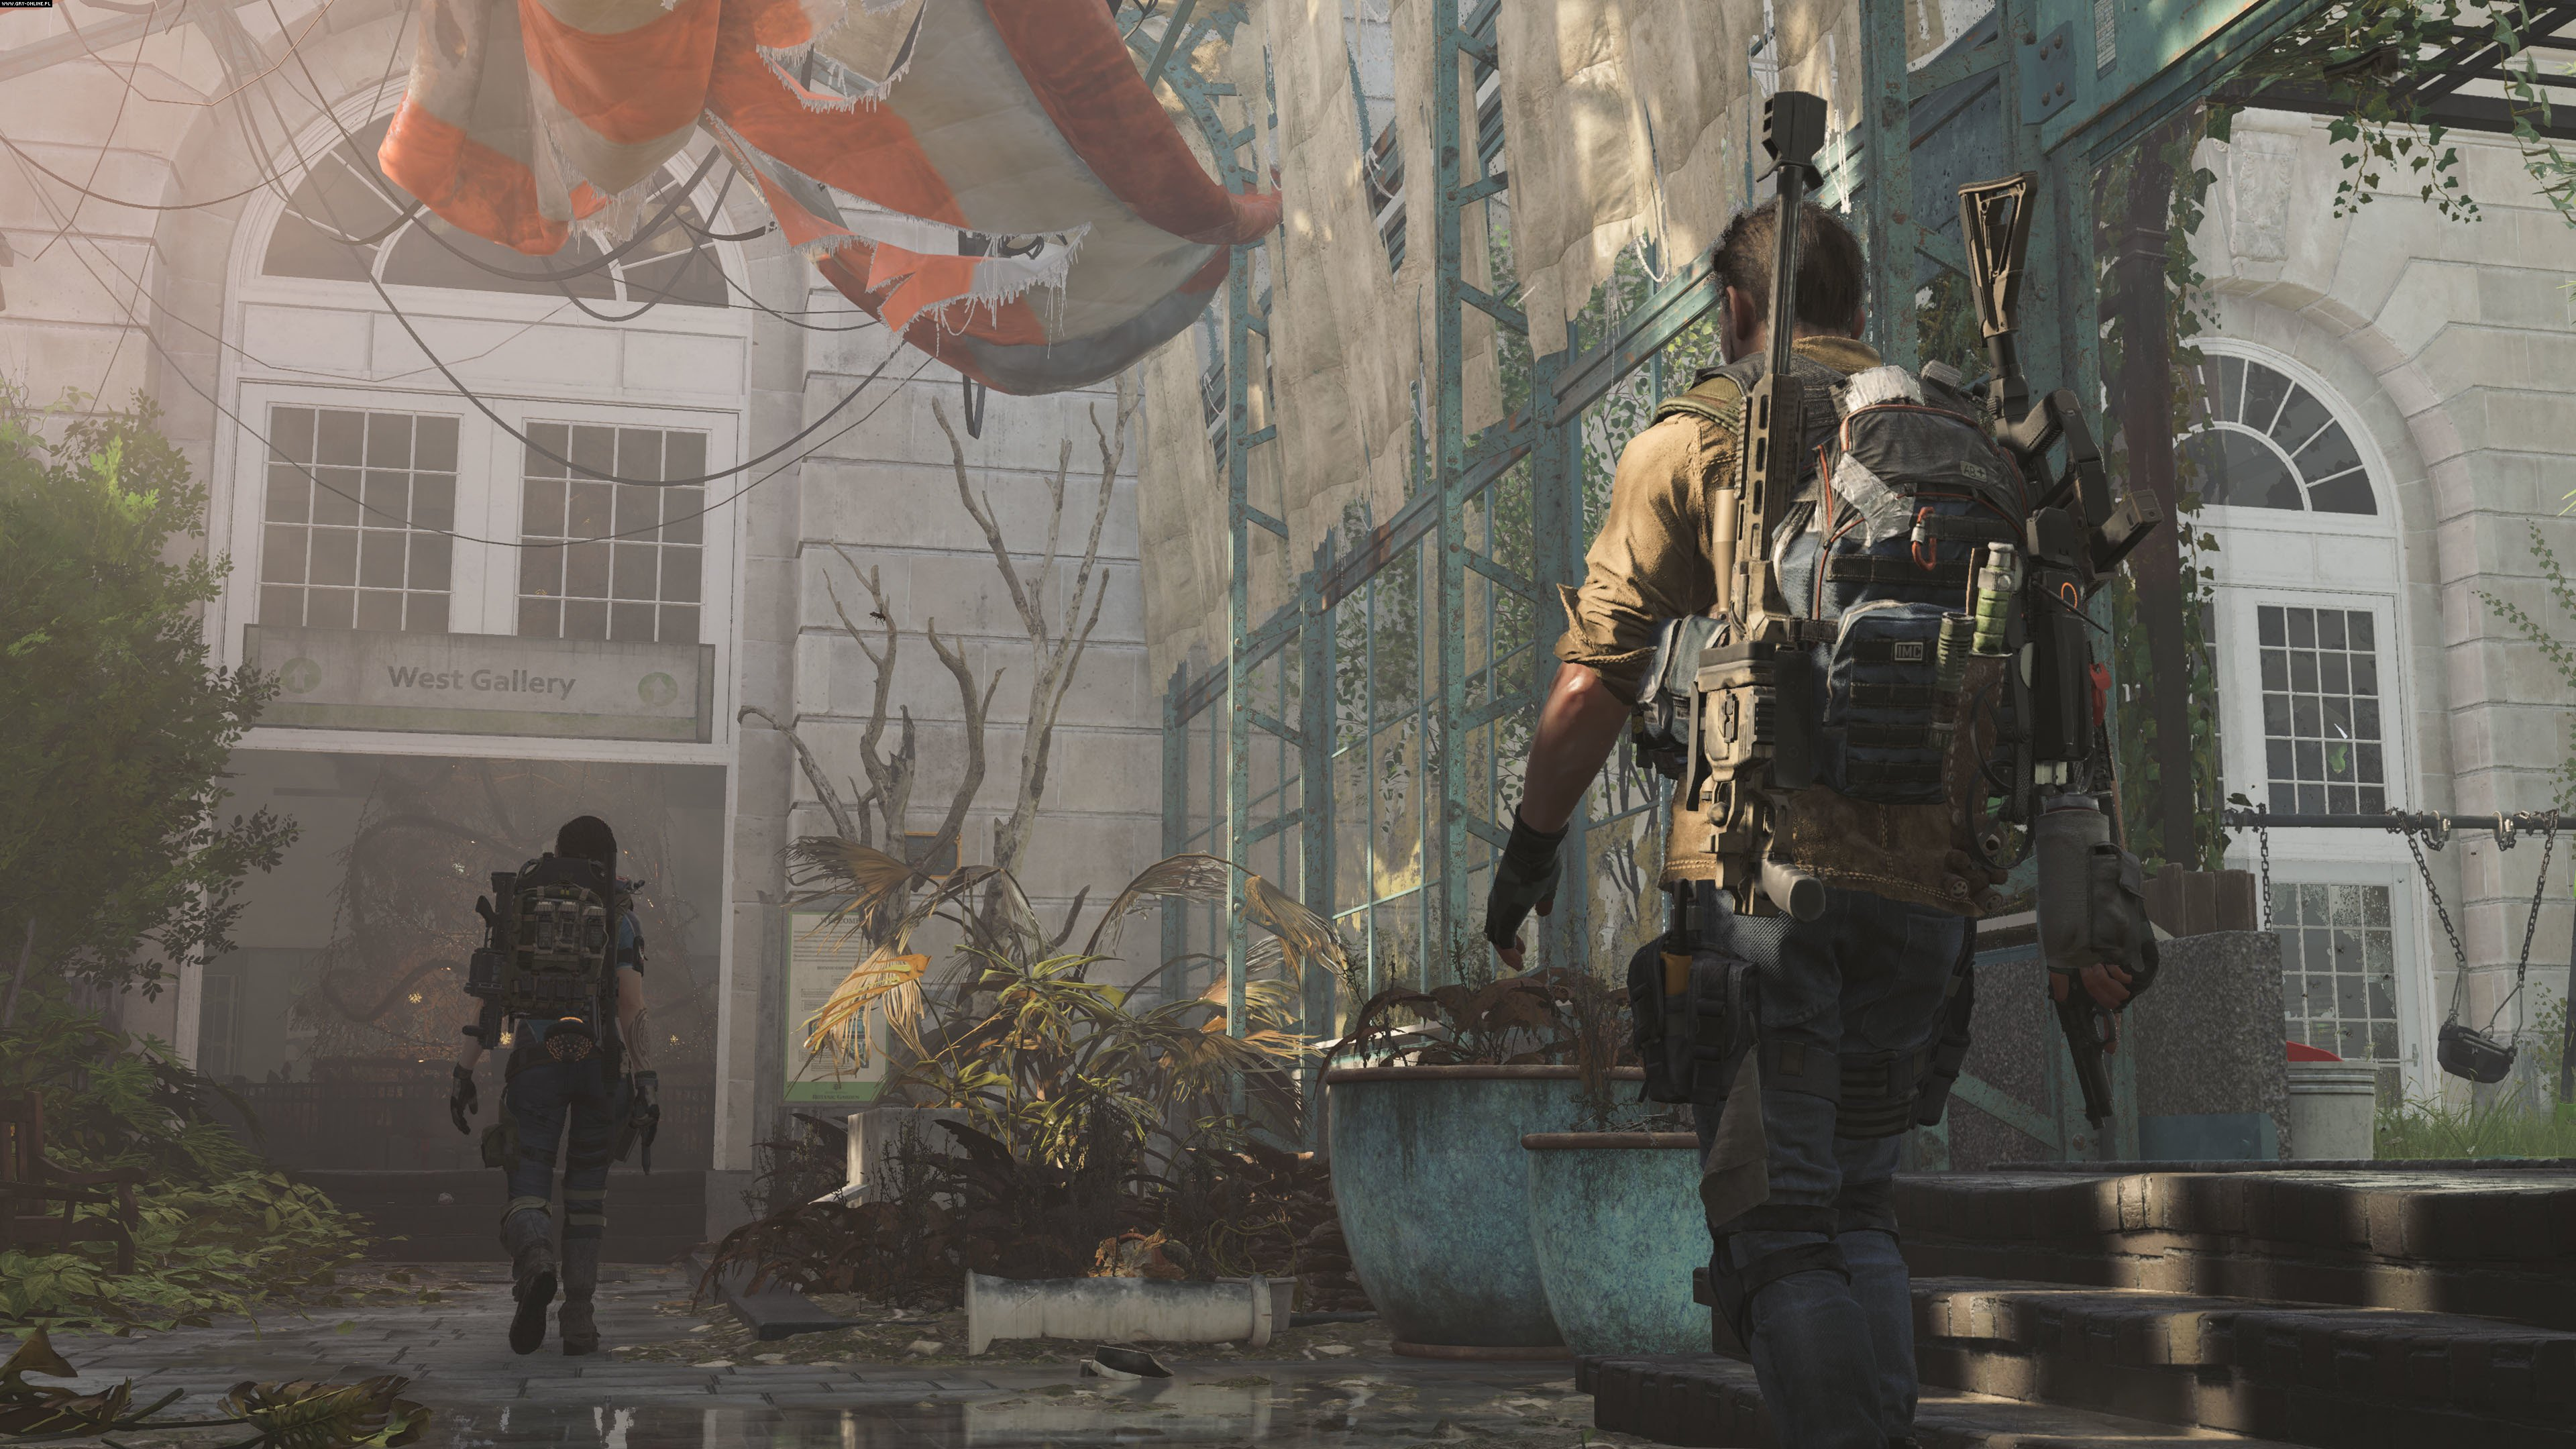 Tom Clancy's The Division 2 PC, PS4, XONE Games Image 21/23, Massive Entertainment / Ubisoft Massive, Ubisoft